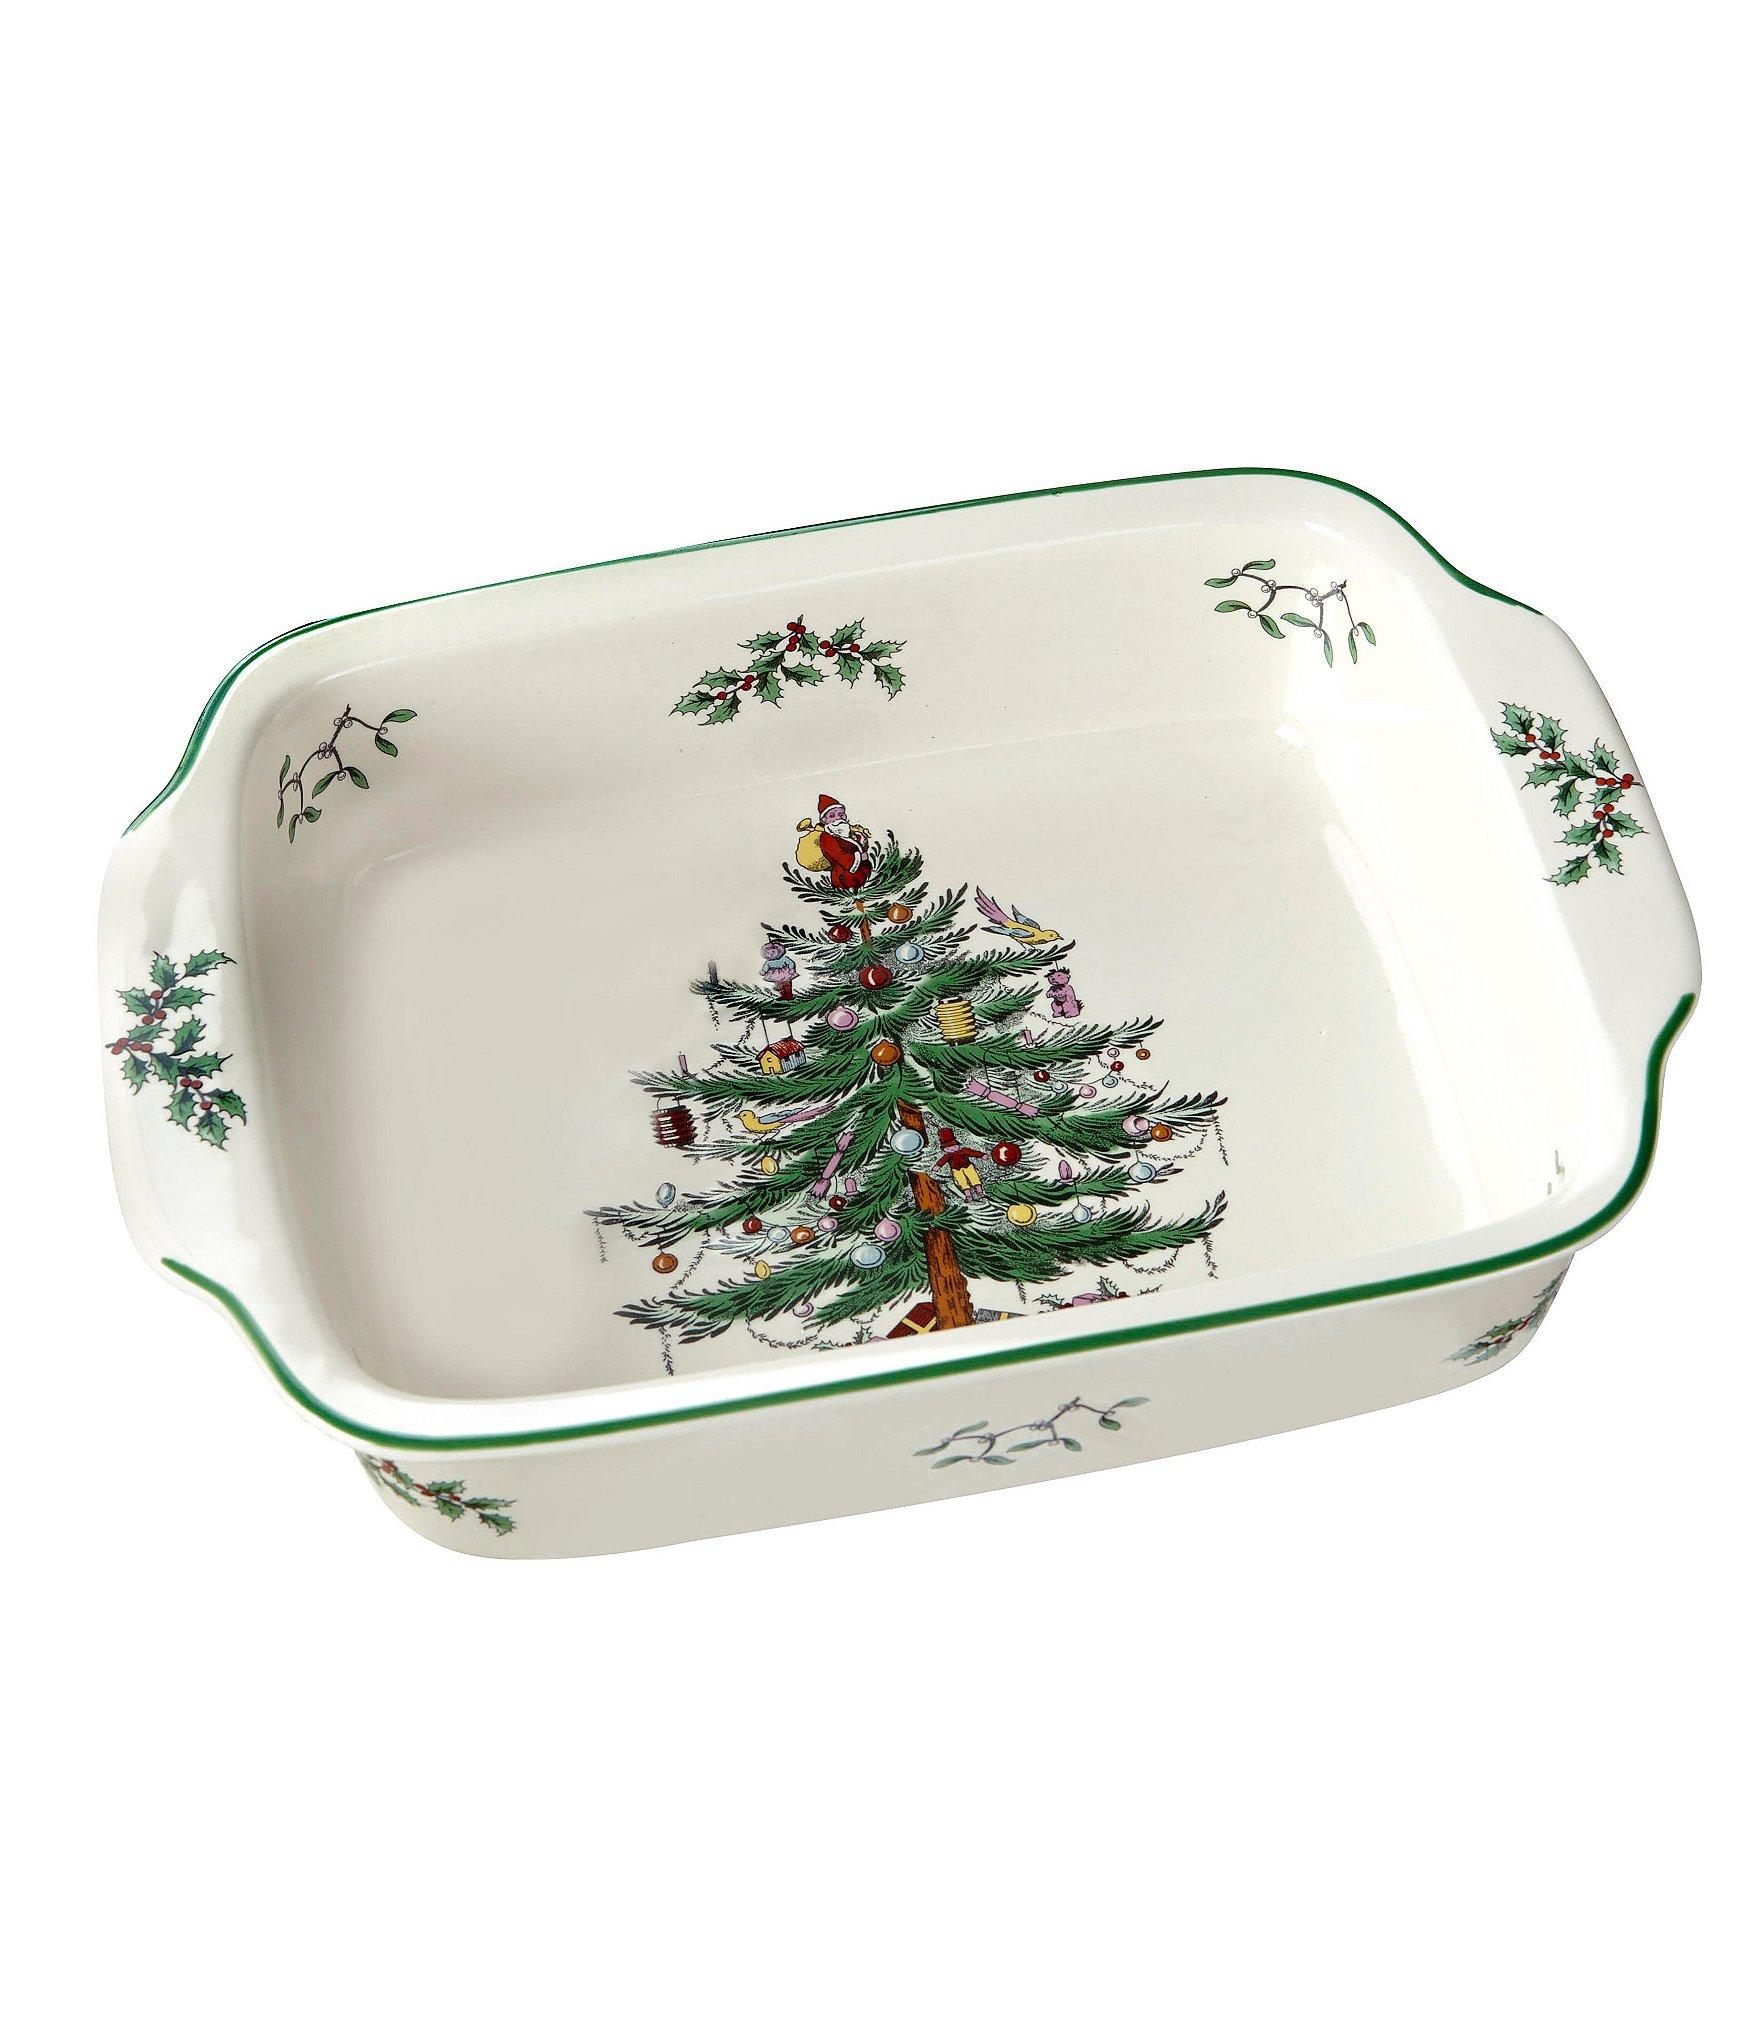 Holiday & Christmas Serveware | Dillards